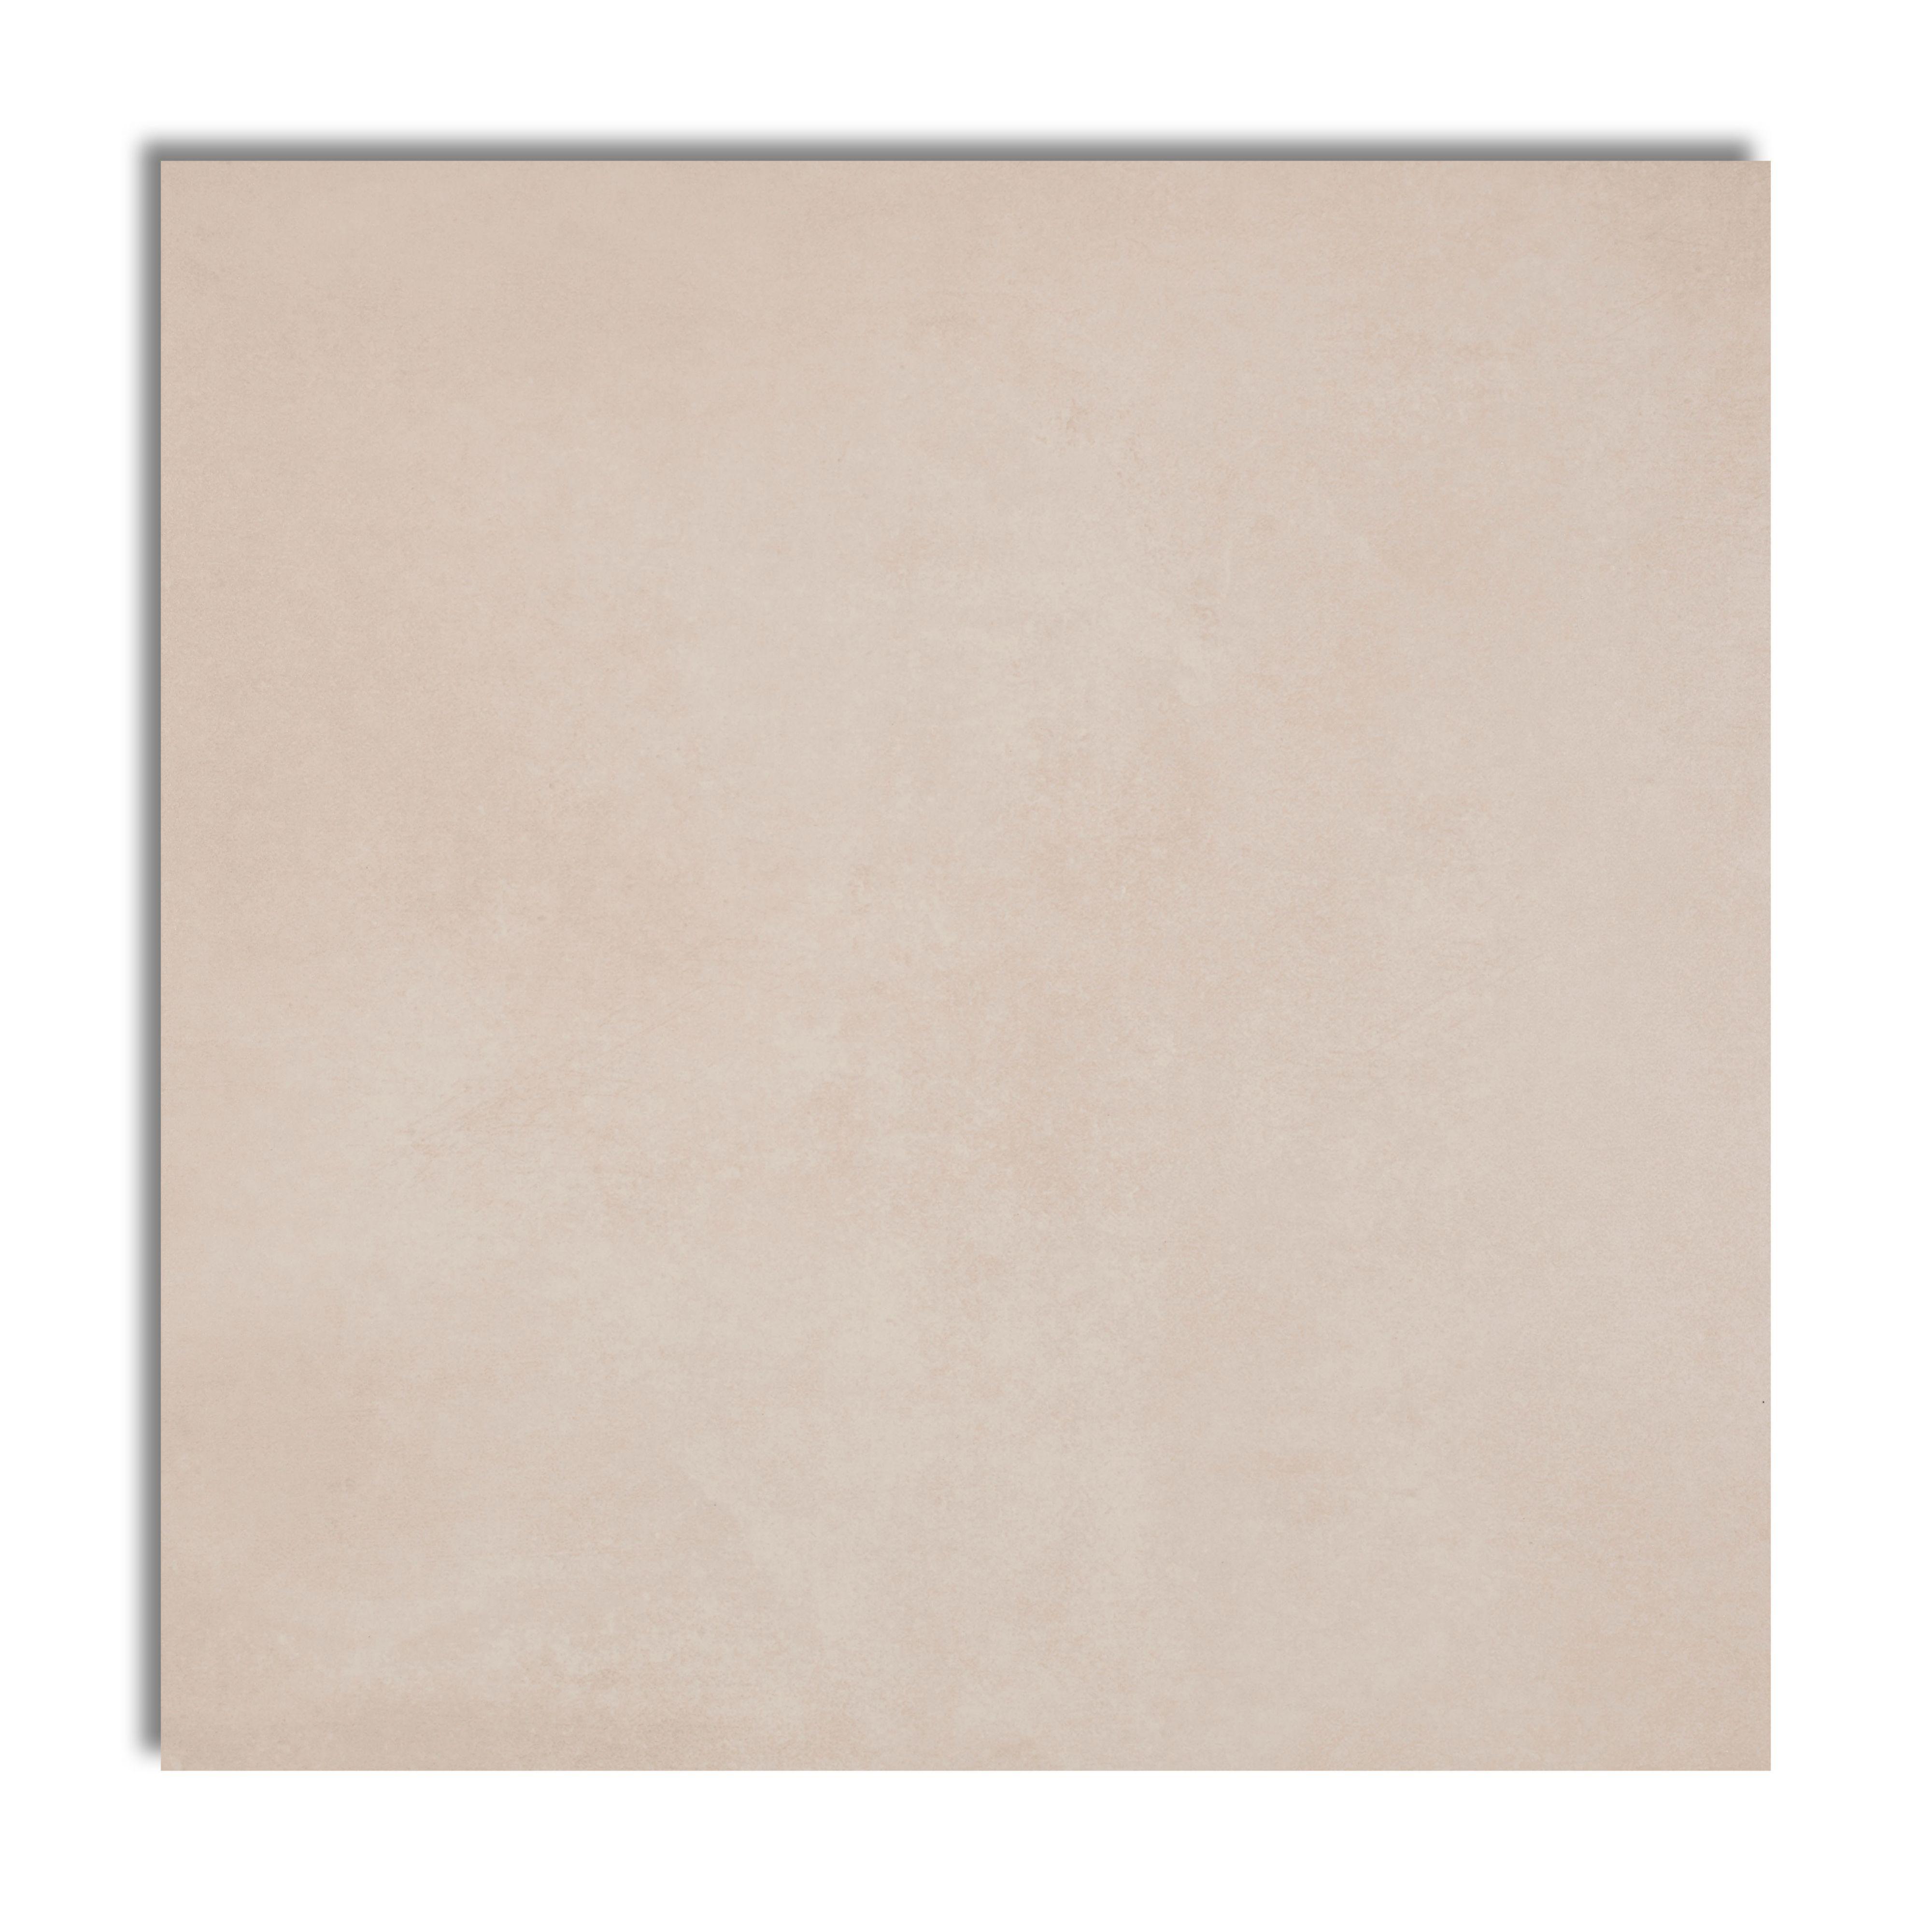 Washington Stone Stone Effect Porcelain Floor Tile, Pack Of 5, (l)450mm (w)450mm